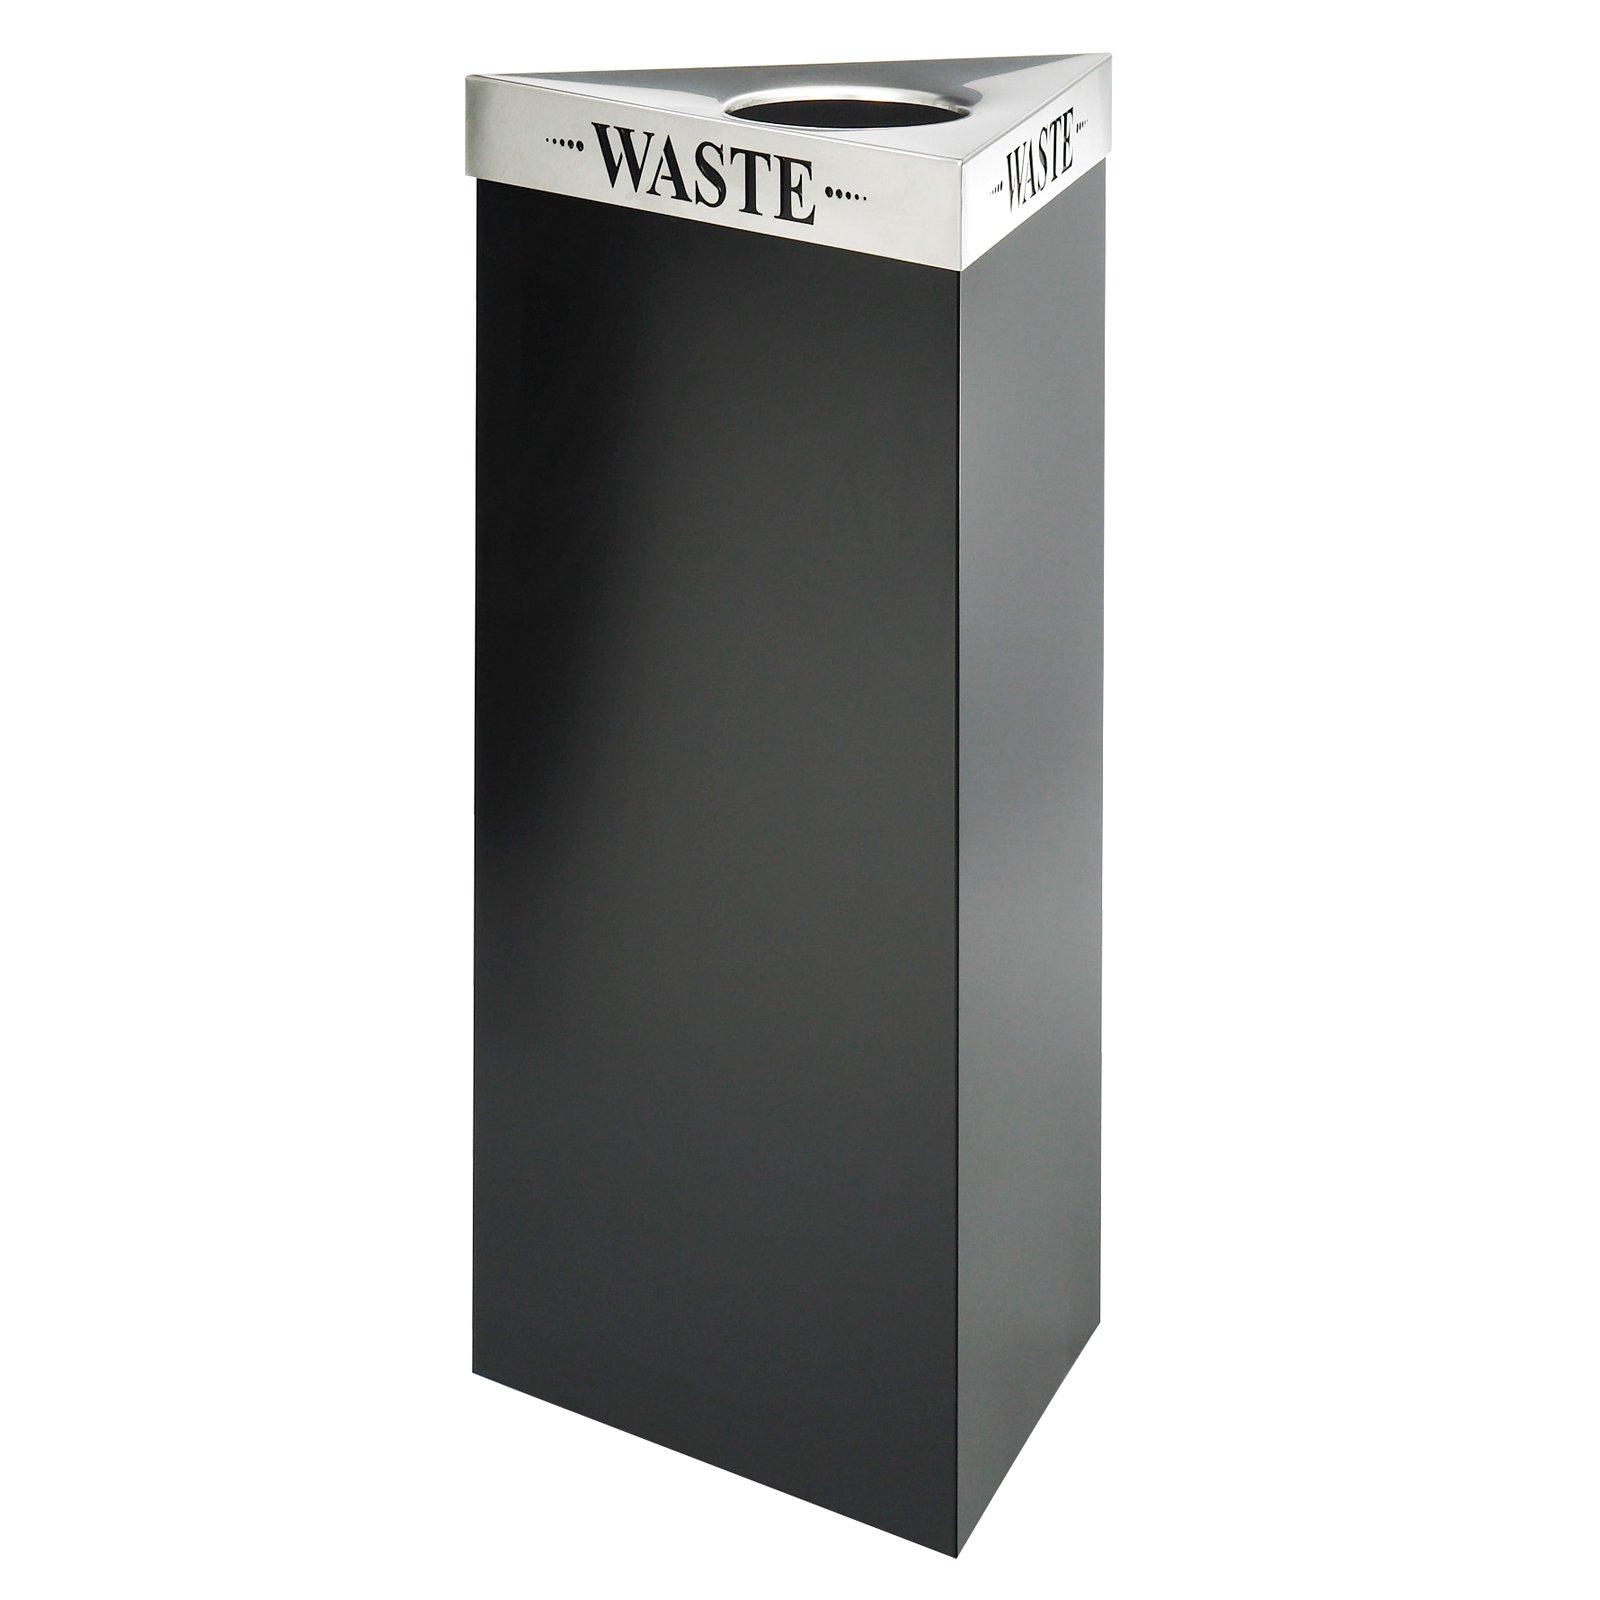 Safco Trifecta 21 Gallon Waste Receptacle Black Recycling Bin